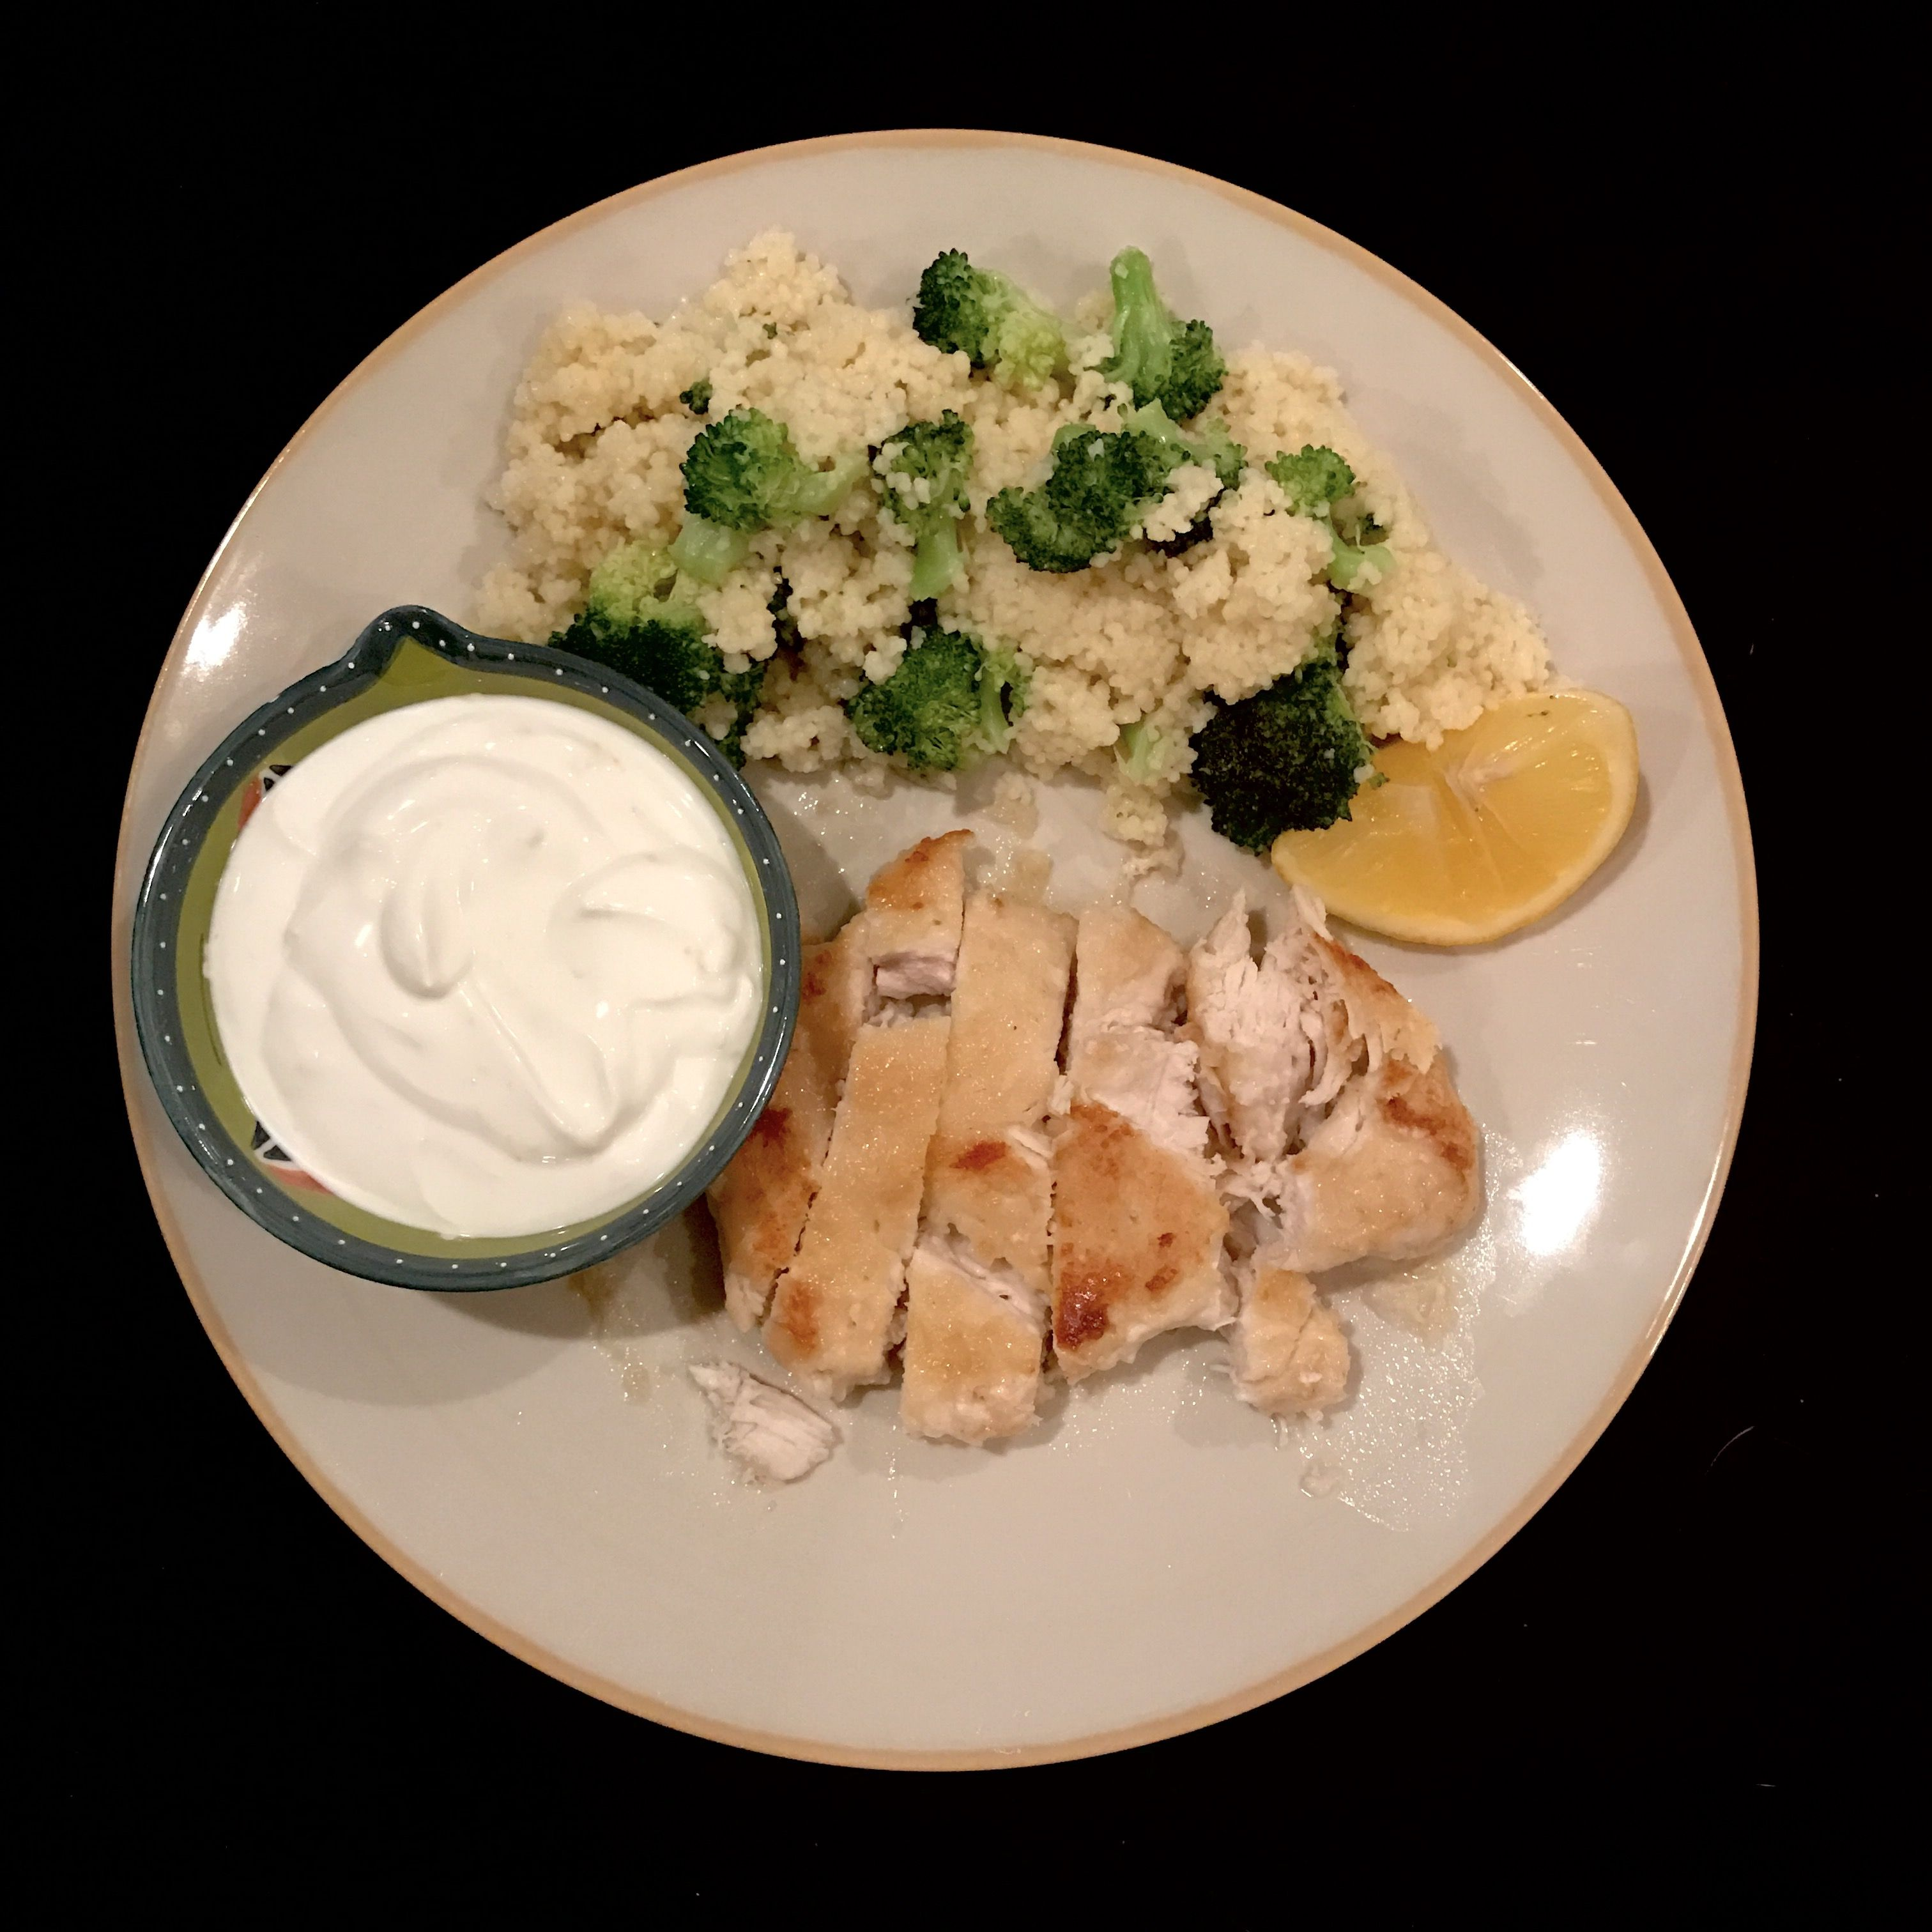 Blue apron broccoli - Seared Chicken Couscous With Broccoli And Lemon Yogurt Sauce Blueapron